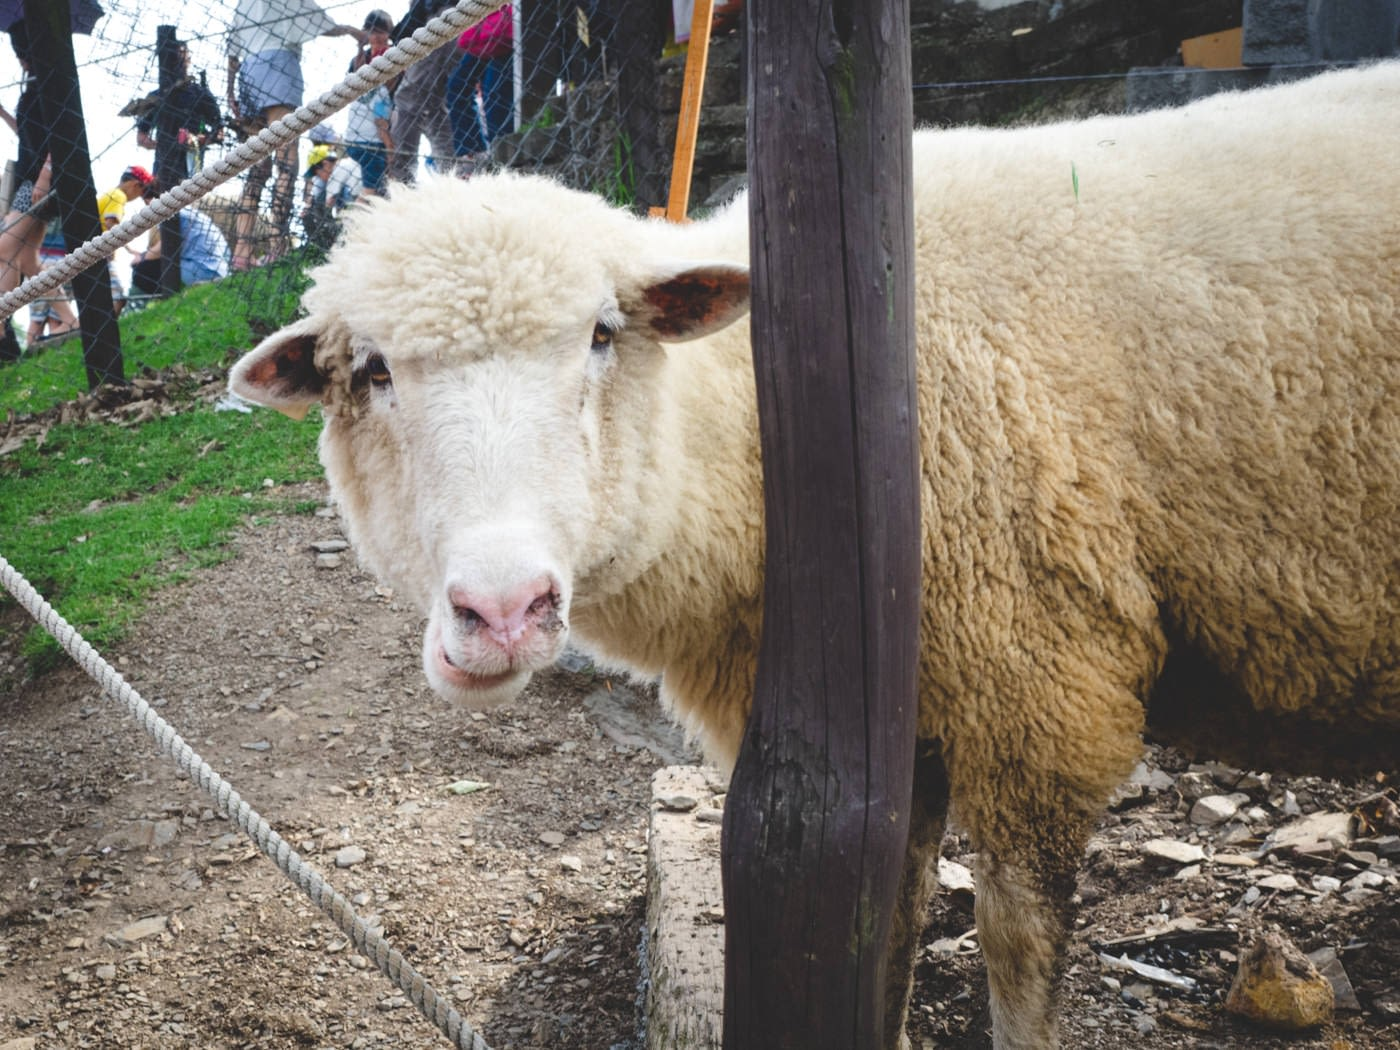 Taiwan - Qingjing Farm - Sheep smirks